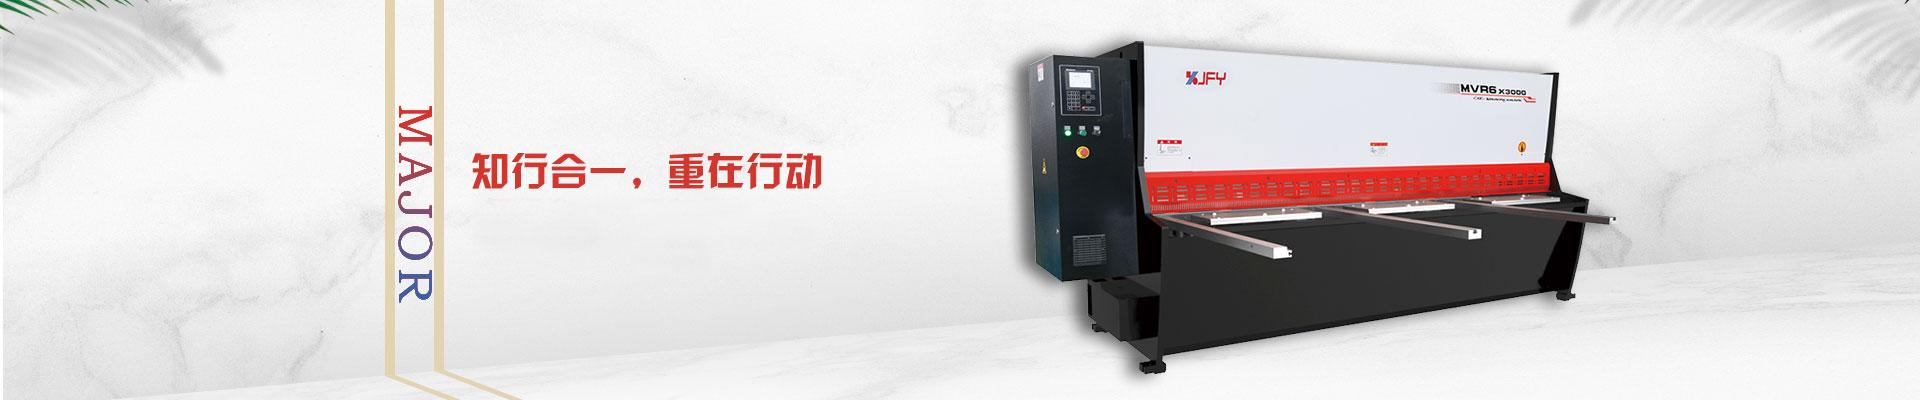 http://www.jinfangyuan.com/data/images/slide/20200221155113_883.jpg